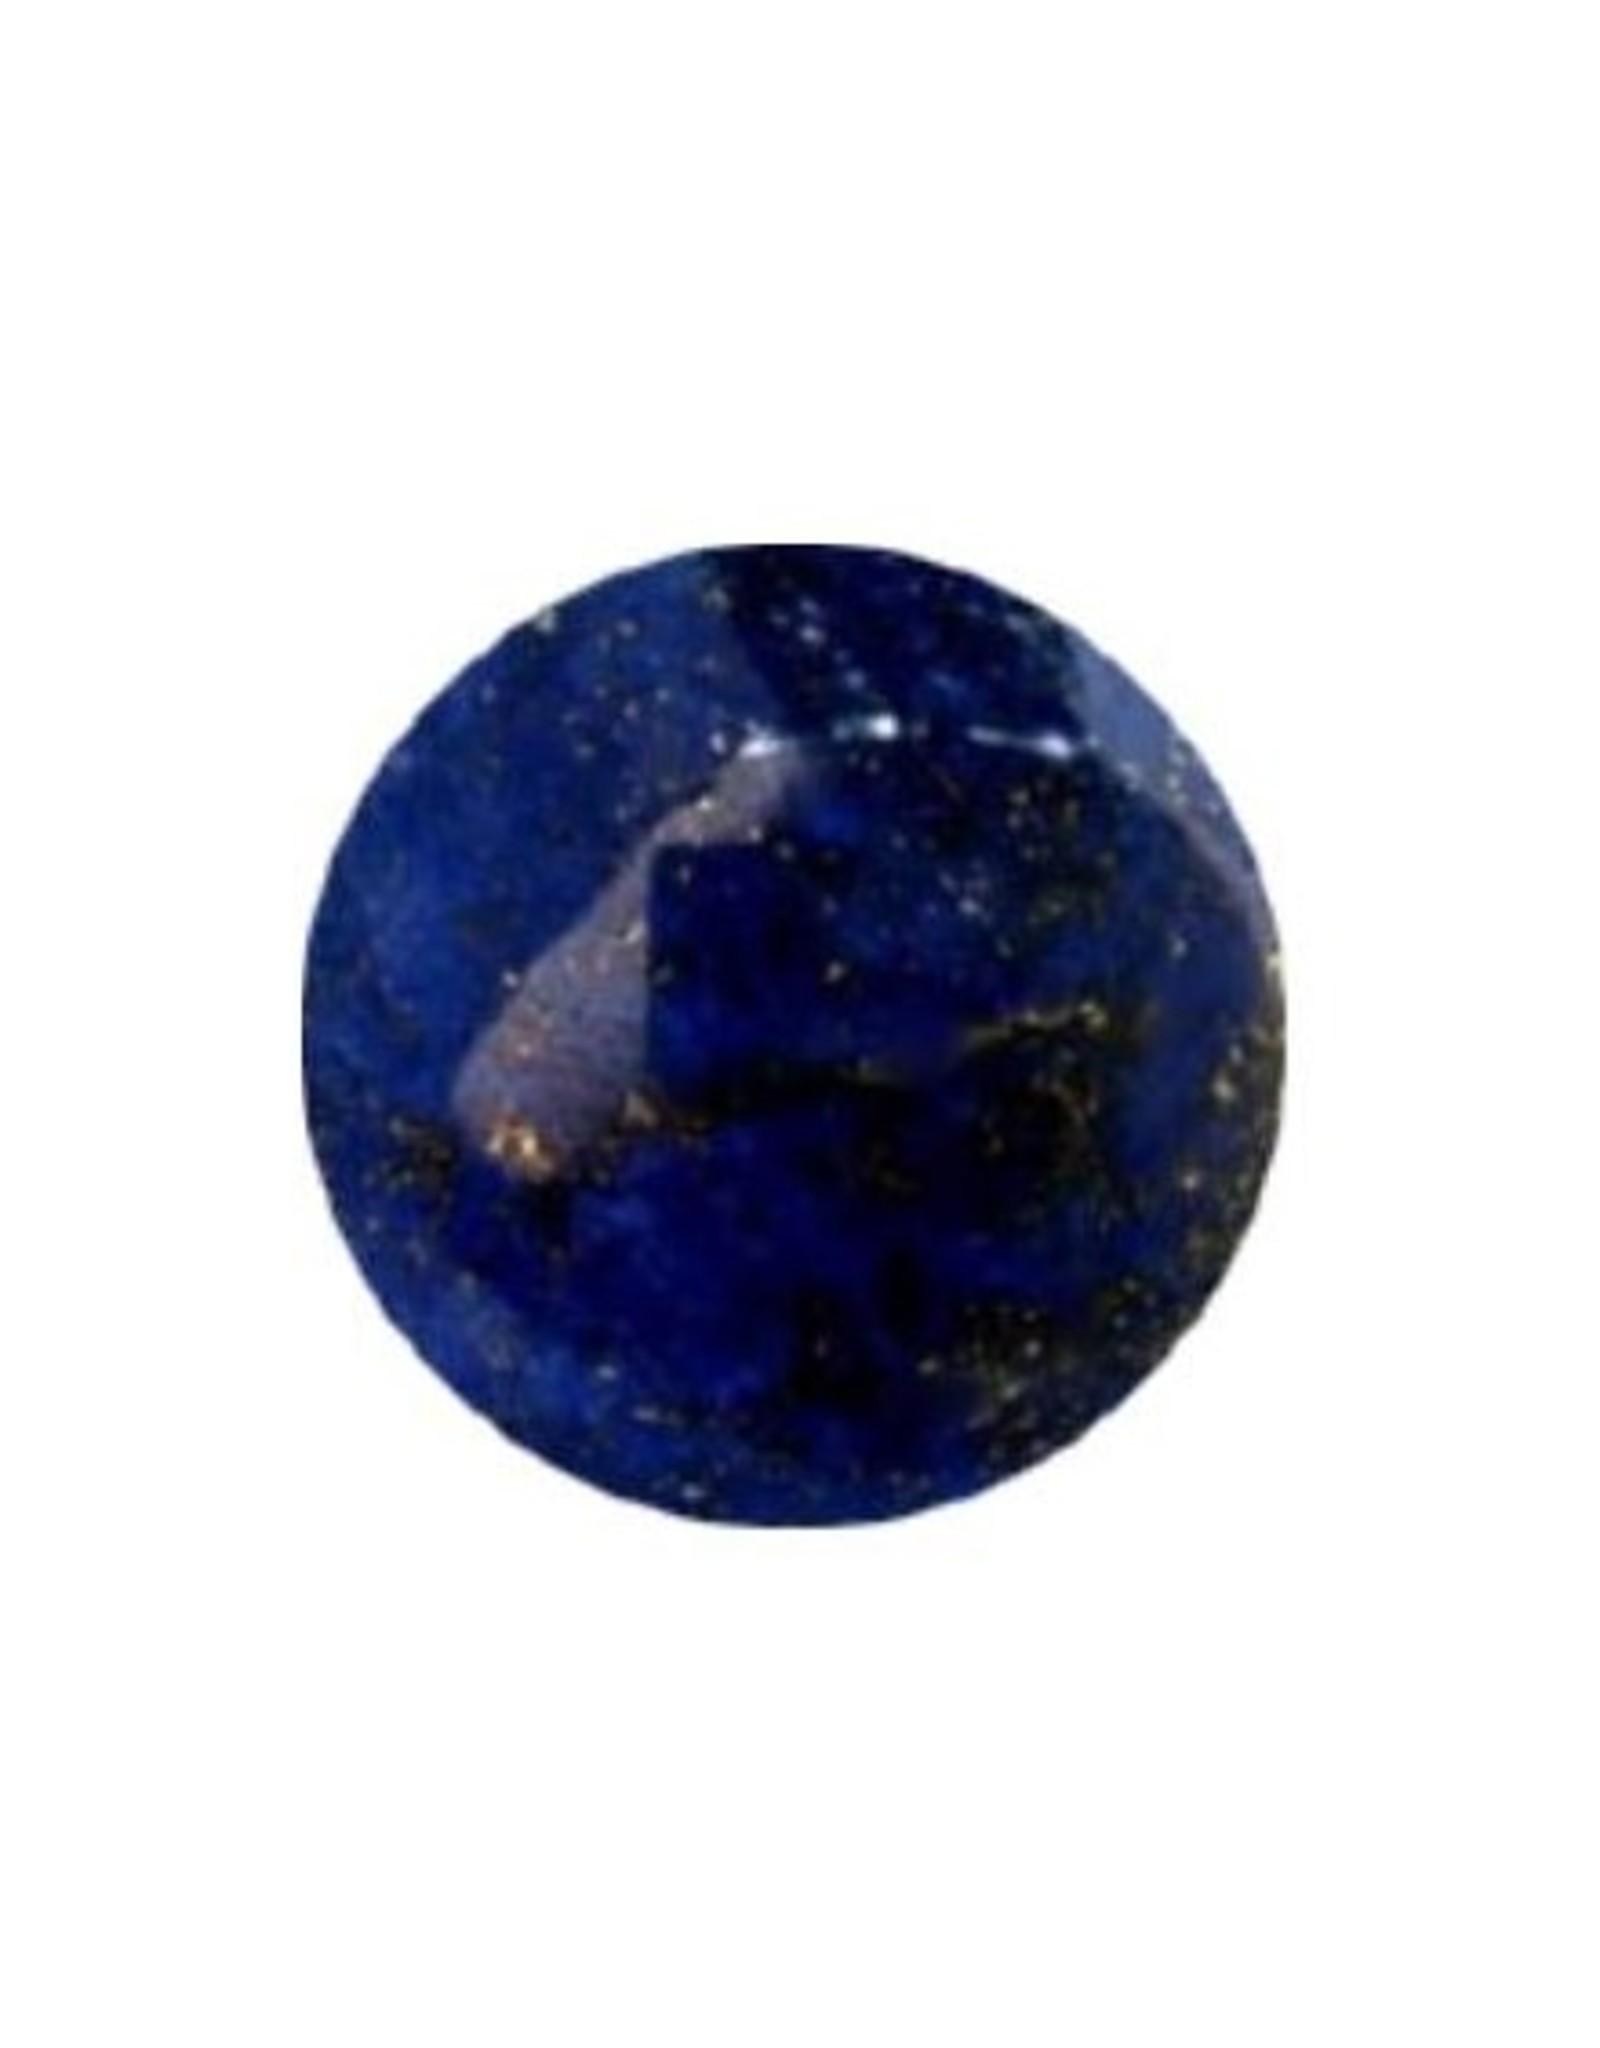 Wisselsteen Lapis Lazuli